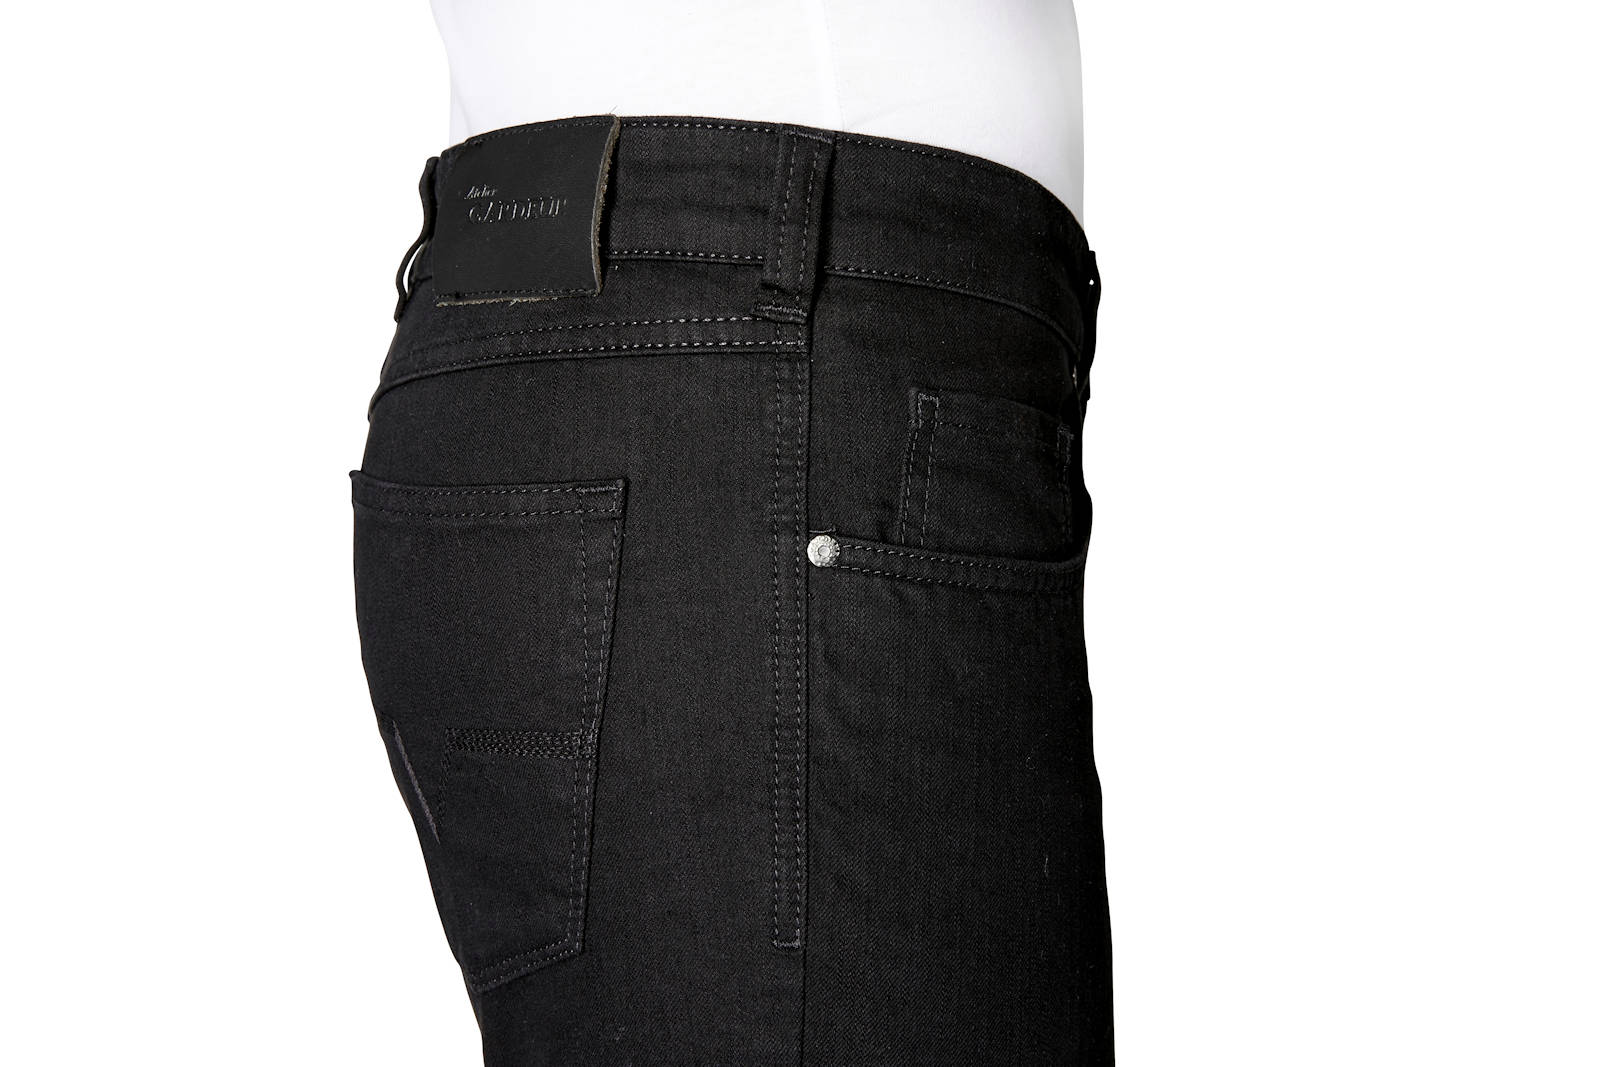 Atelier-GARDEUR-Jeans-NEVIO-11-Regular-Fit-Herren-Hose-Straight-Leg-Denim-NEU Indexbild 17